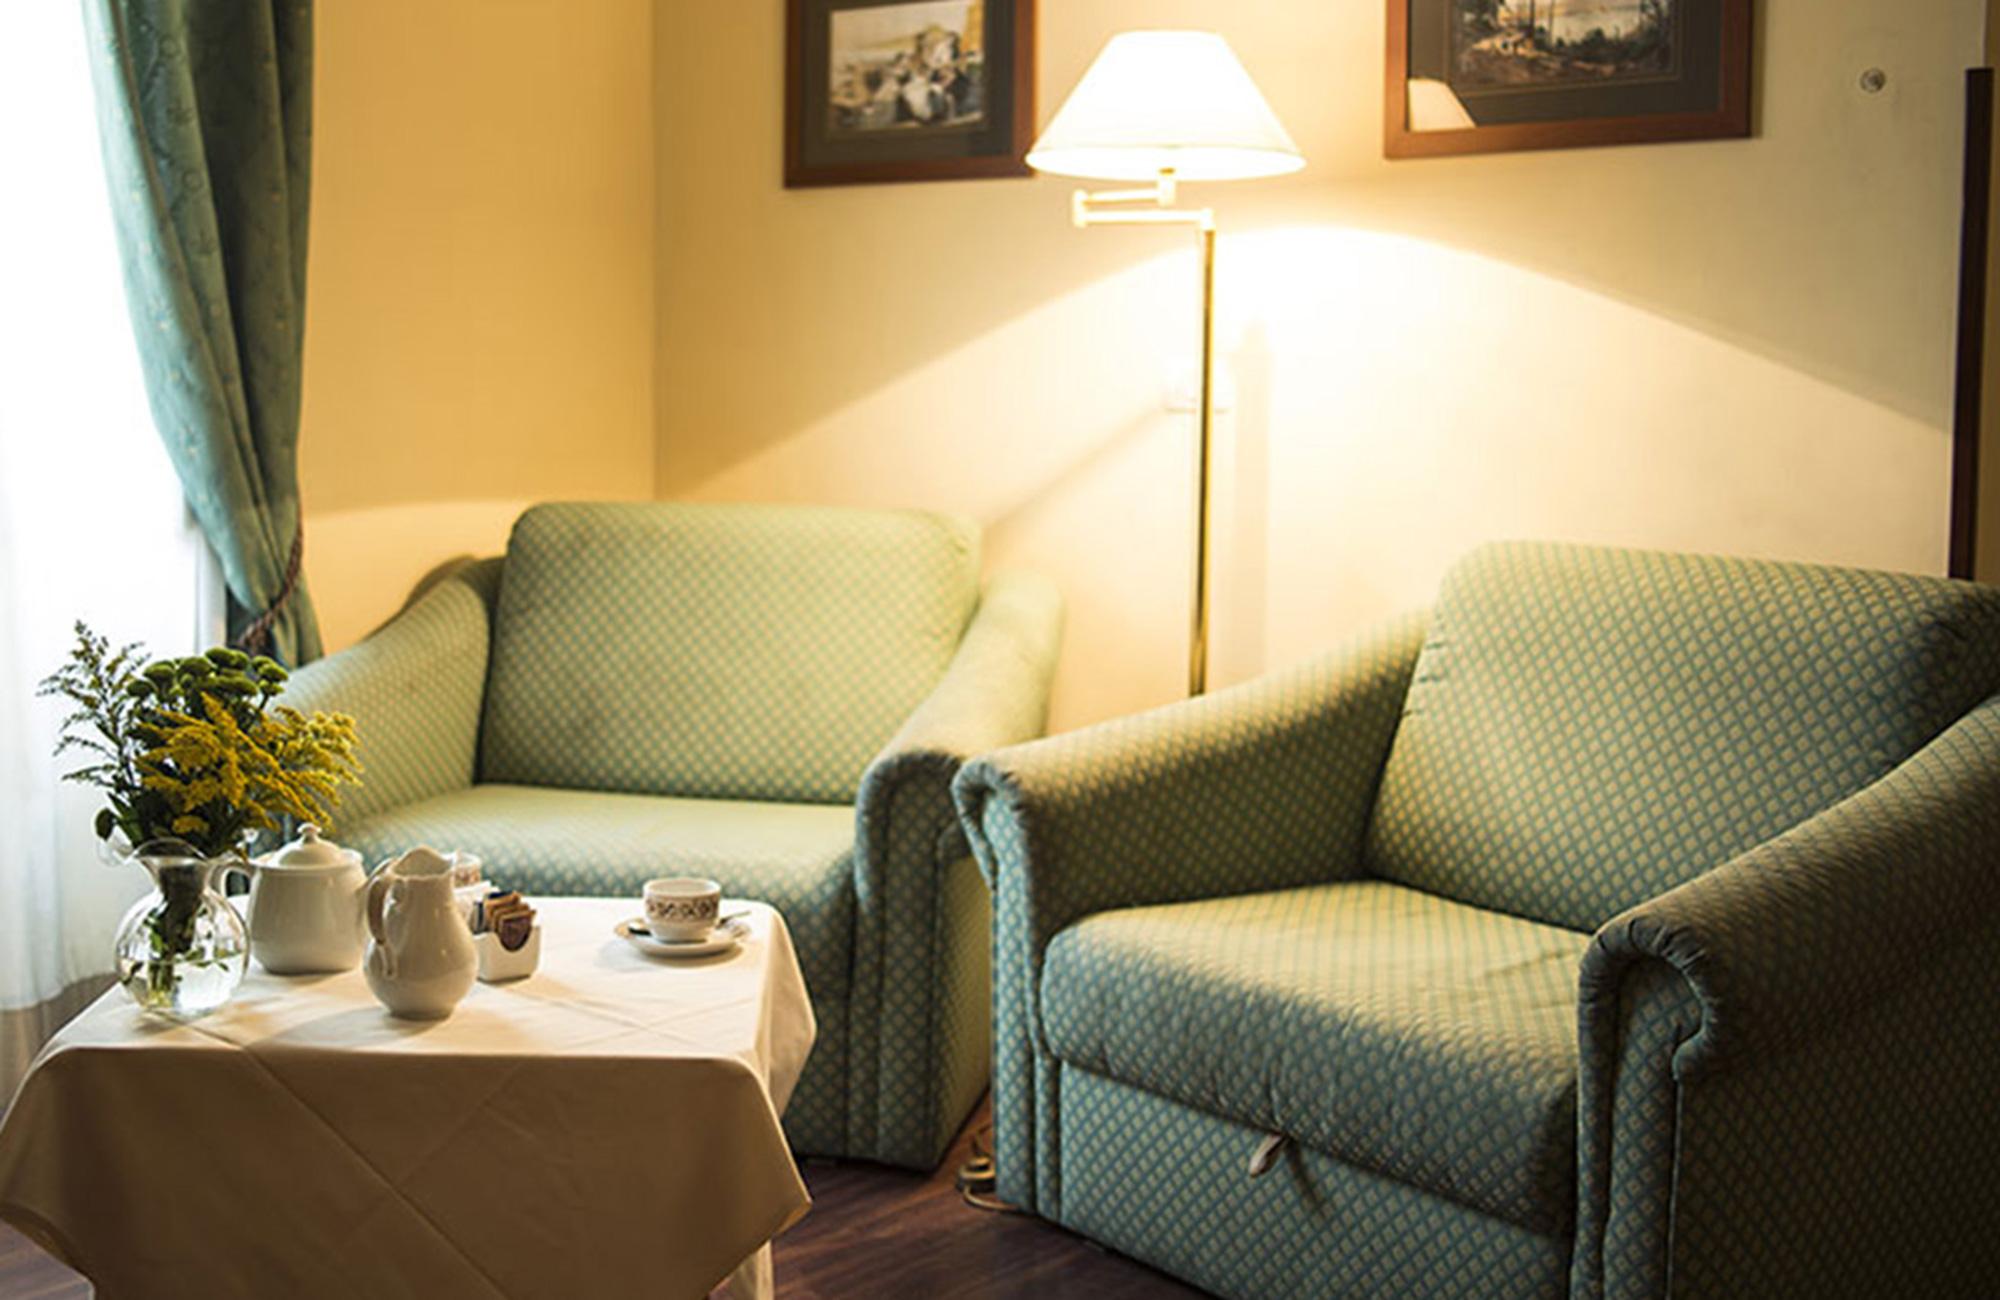 Hotel Real Orto Botanico Gruppresor Till Napoli Kilroy